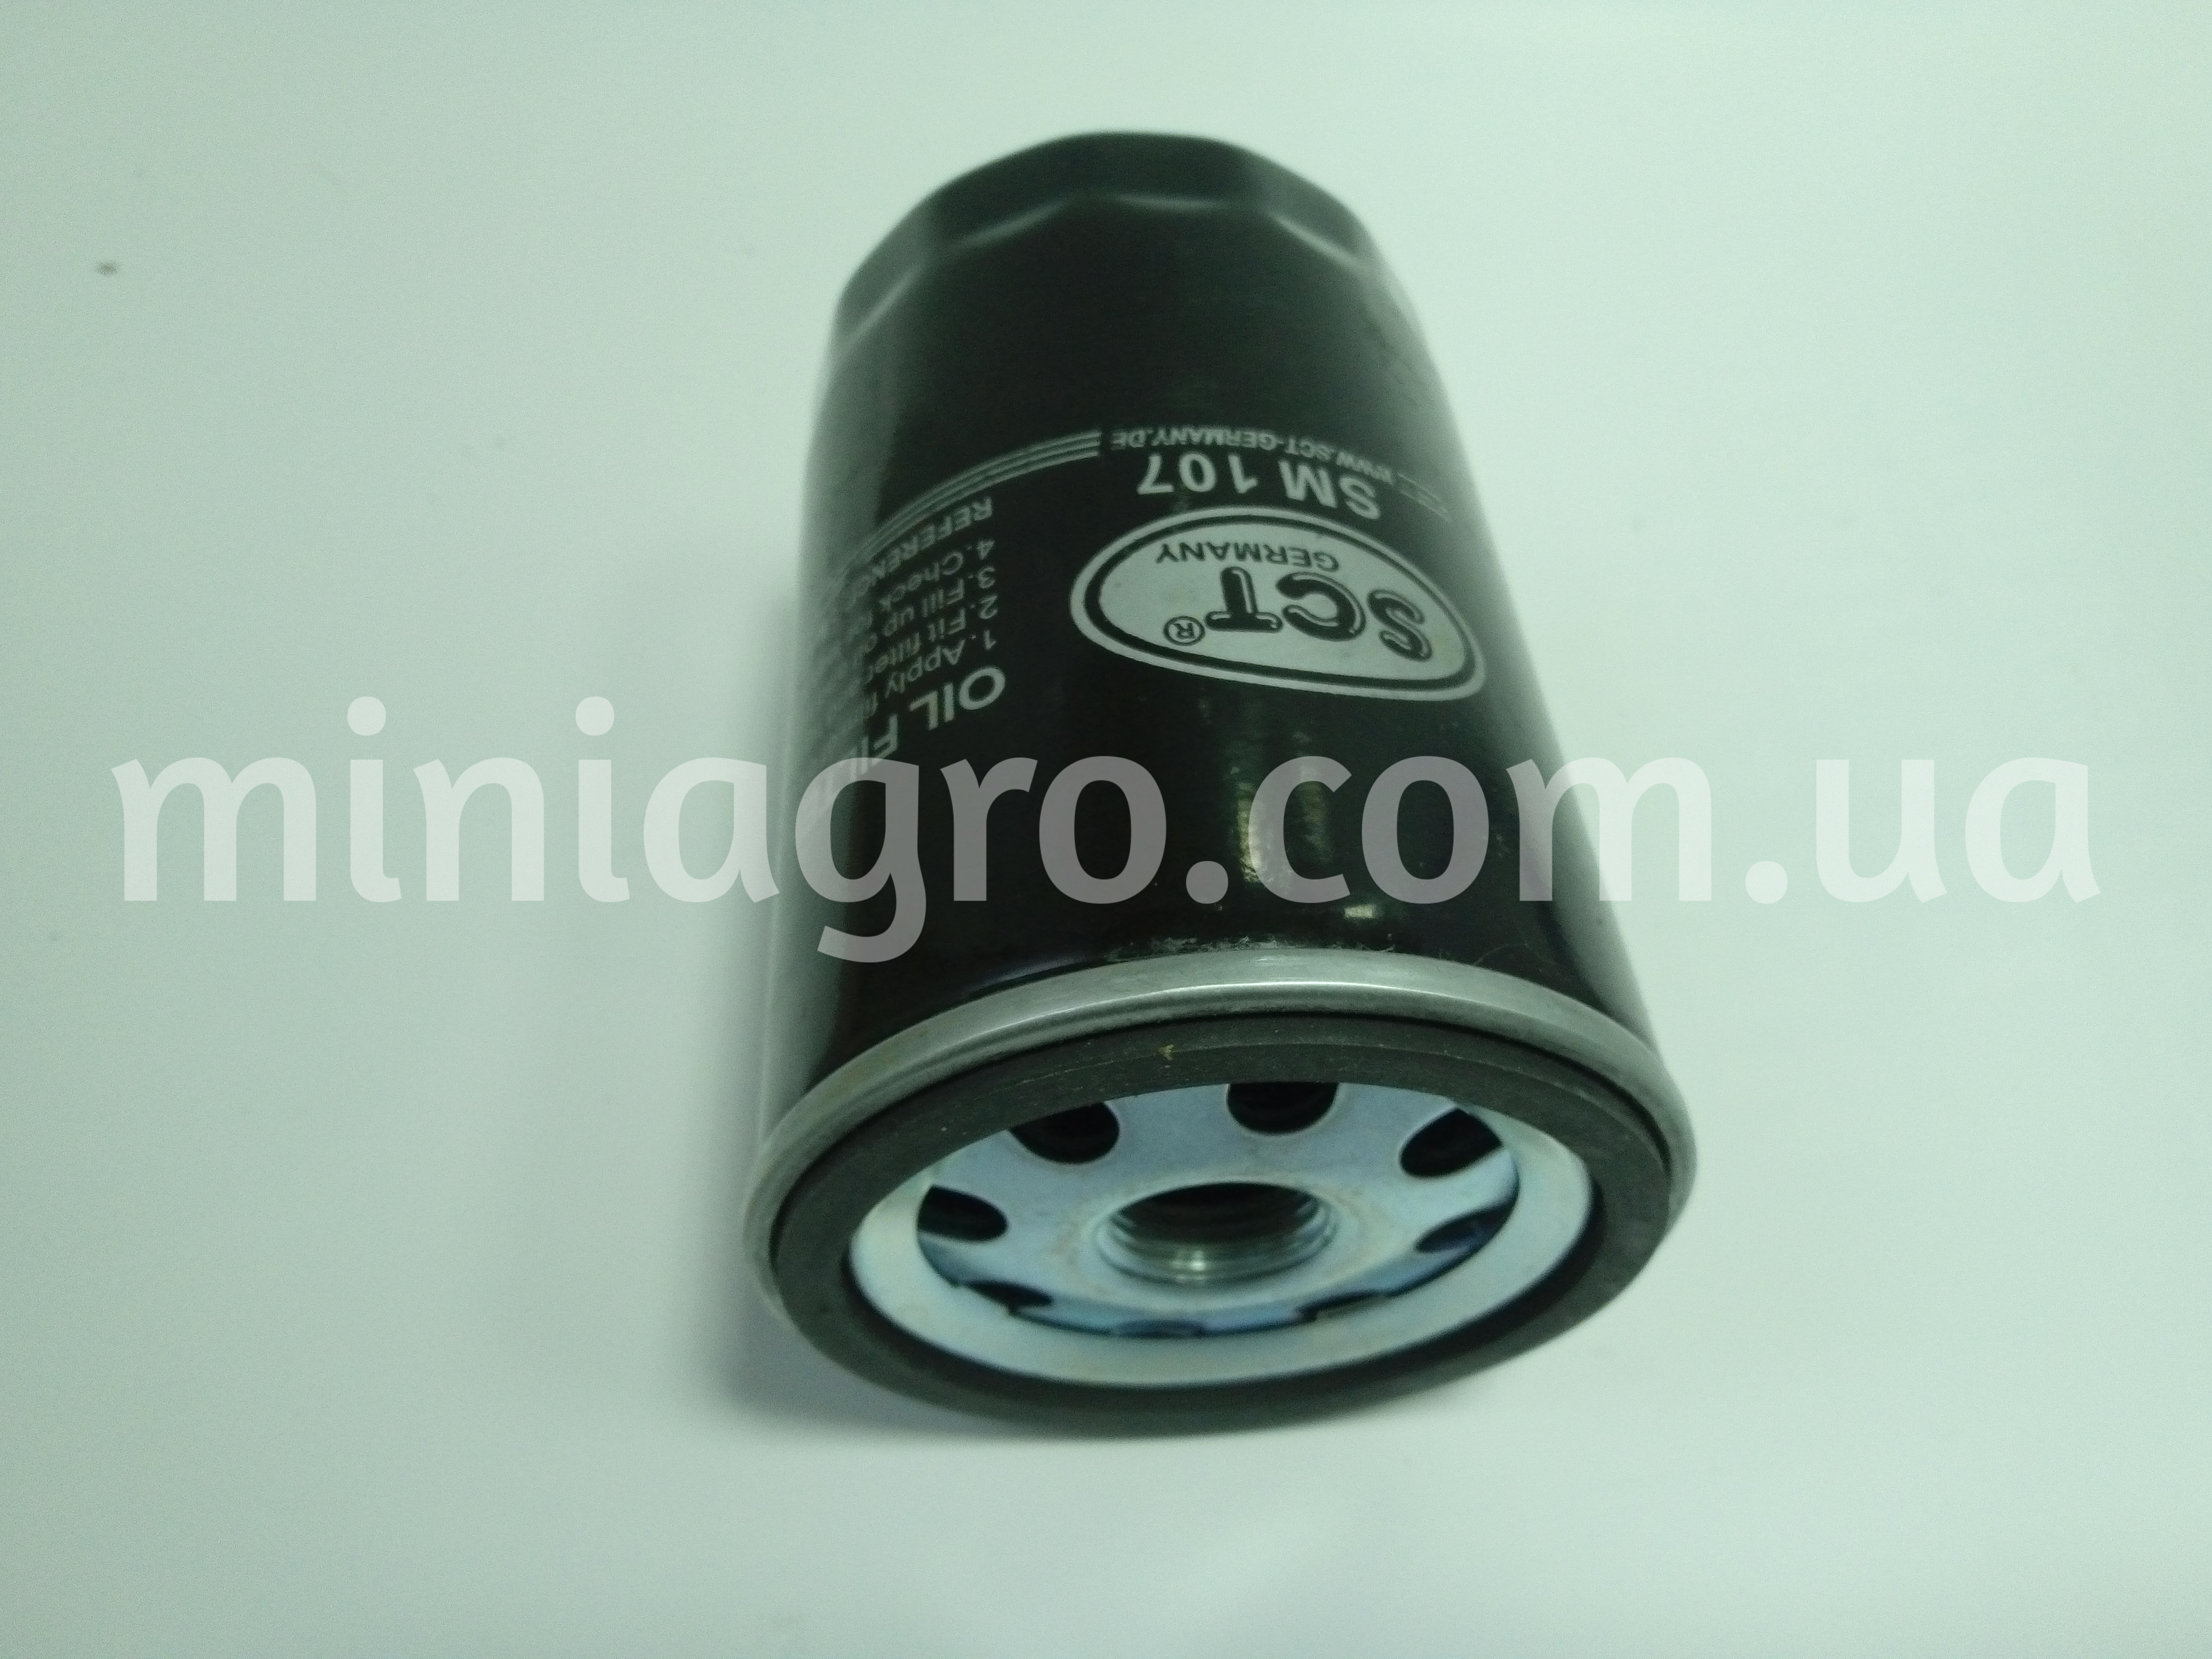 Фильтр масляный Zoomlion 244, Foton 244, Jinma 244 (аналог WB178)